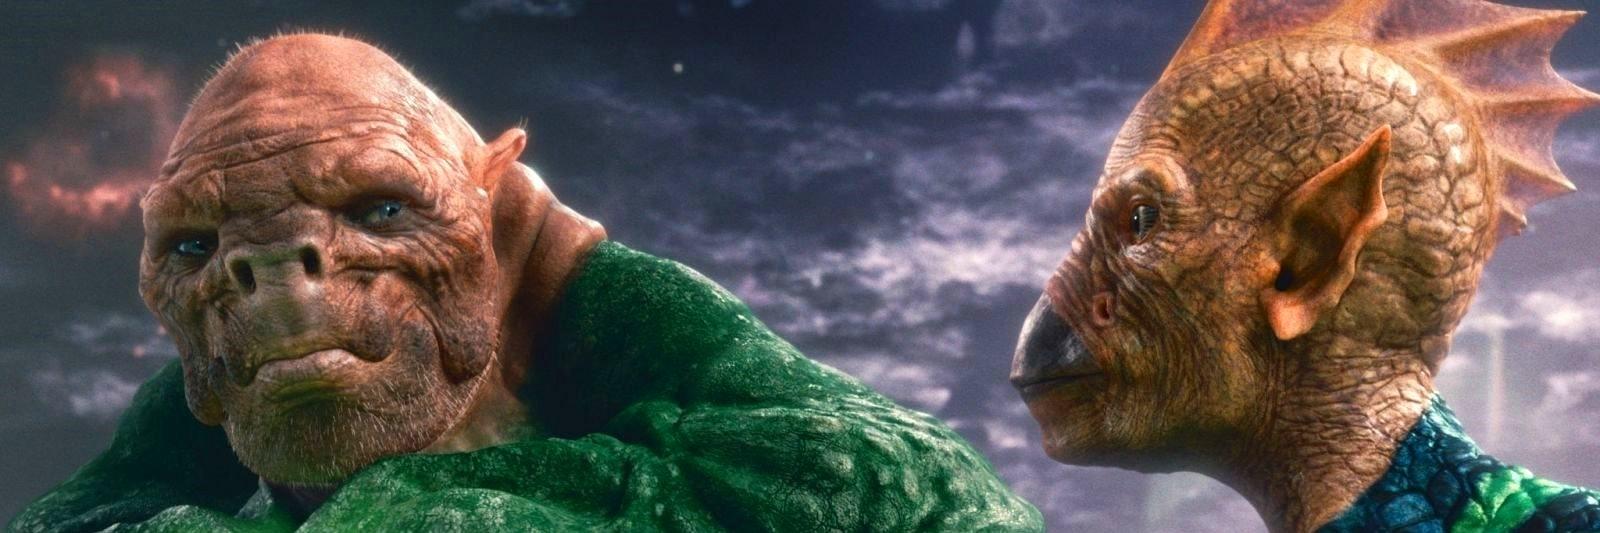 Kilowog in Warner Bros' 2011 'Green Lantern'